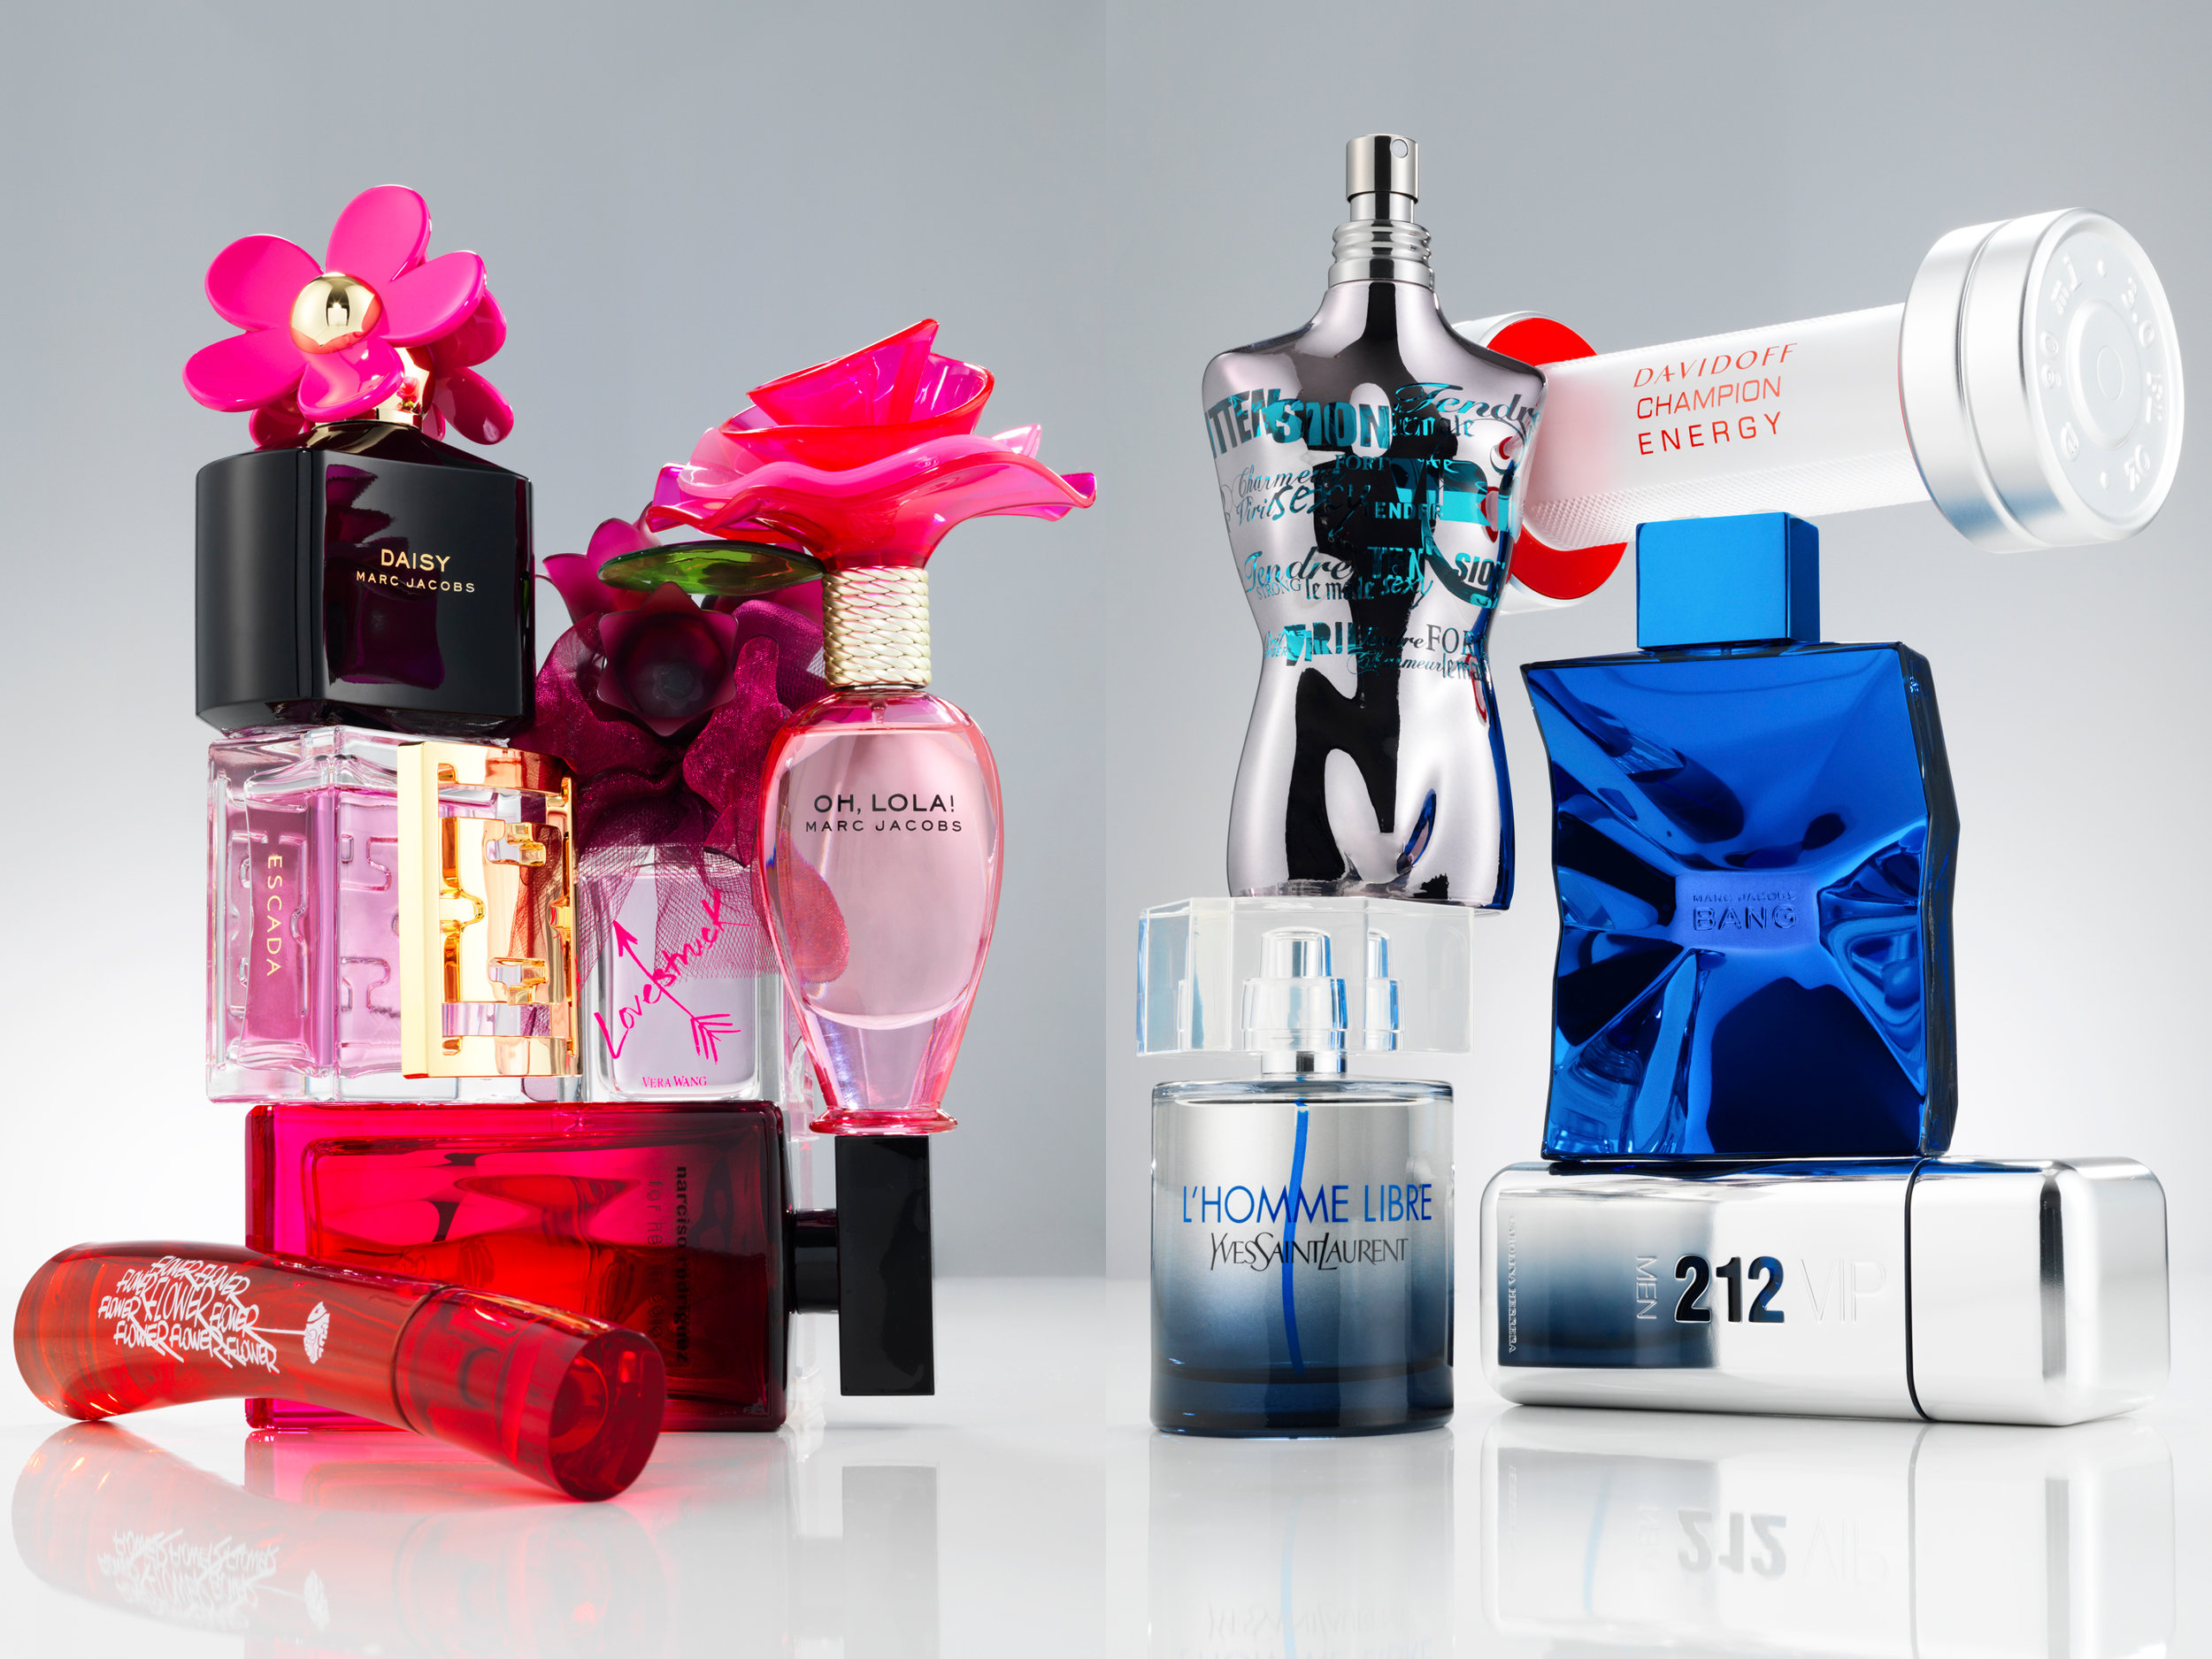 110721_Female_Fragrance_00-copy.jpg